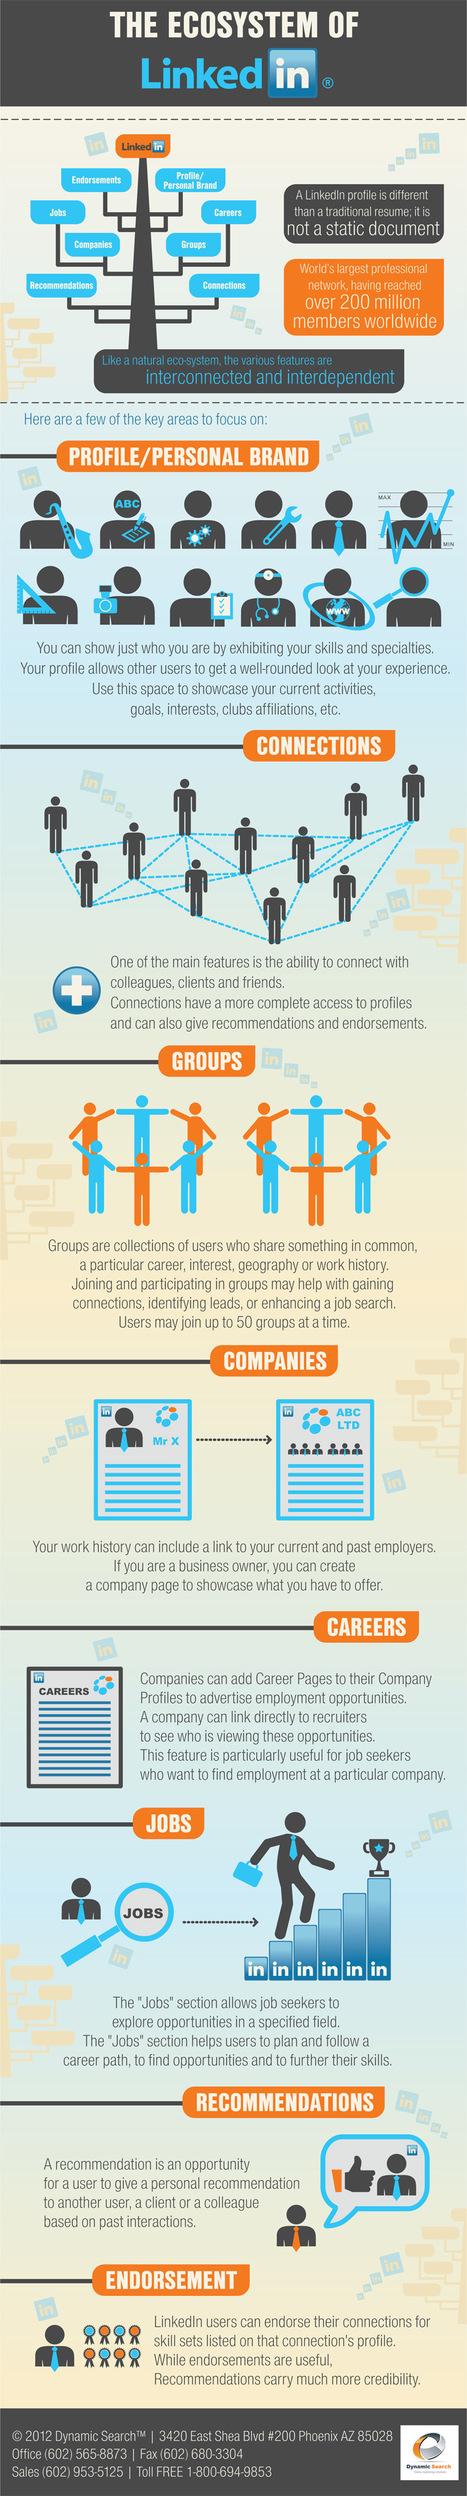 Understanding the LinkedIn Ecosystem in one minute via an infographic /@BerriePelser | WordPress Google SEO and Social Media | Scoop.it